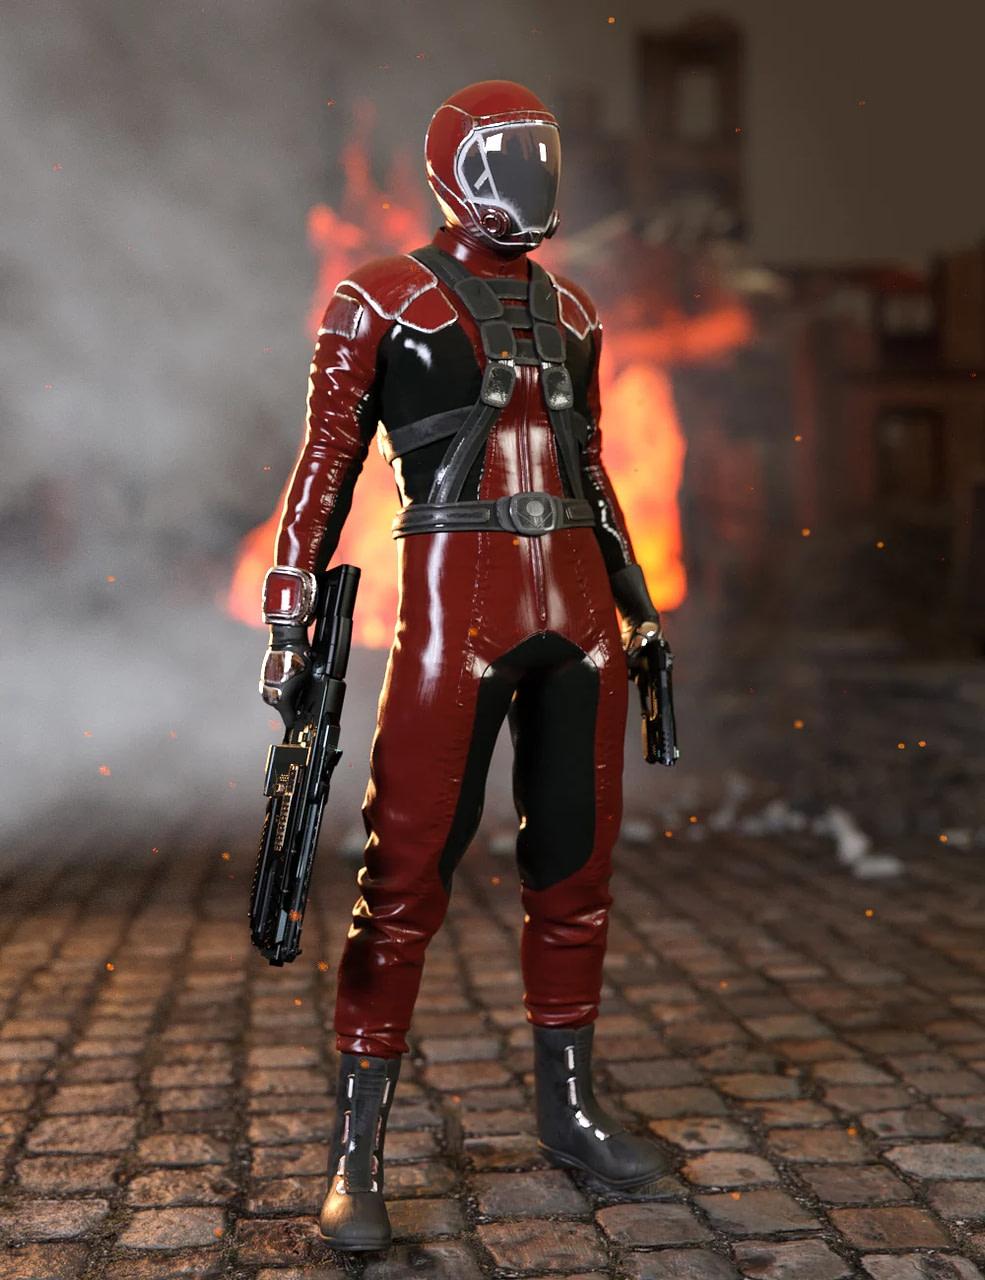 blender 3d printing sci fi gravity suit